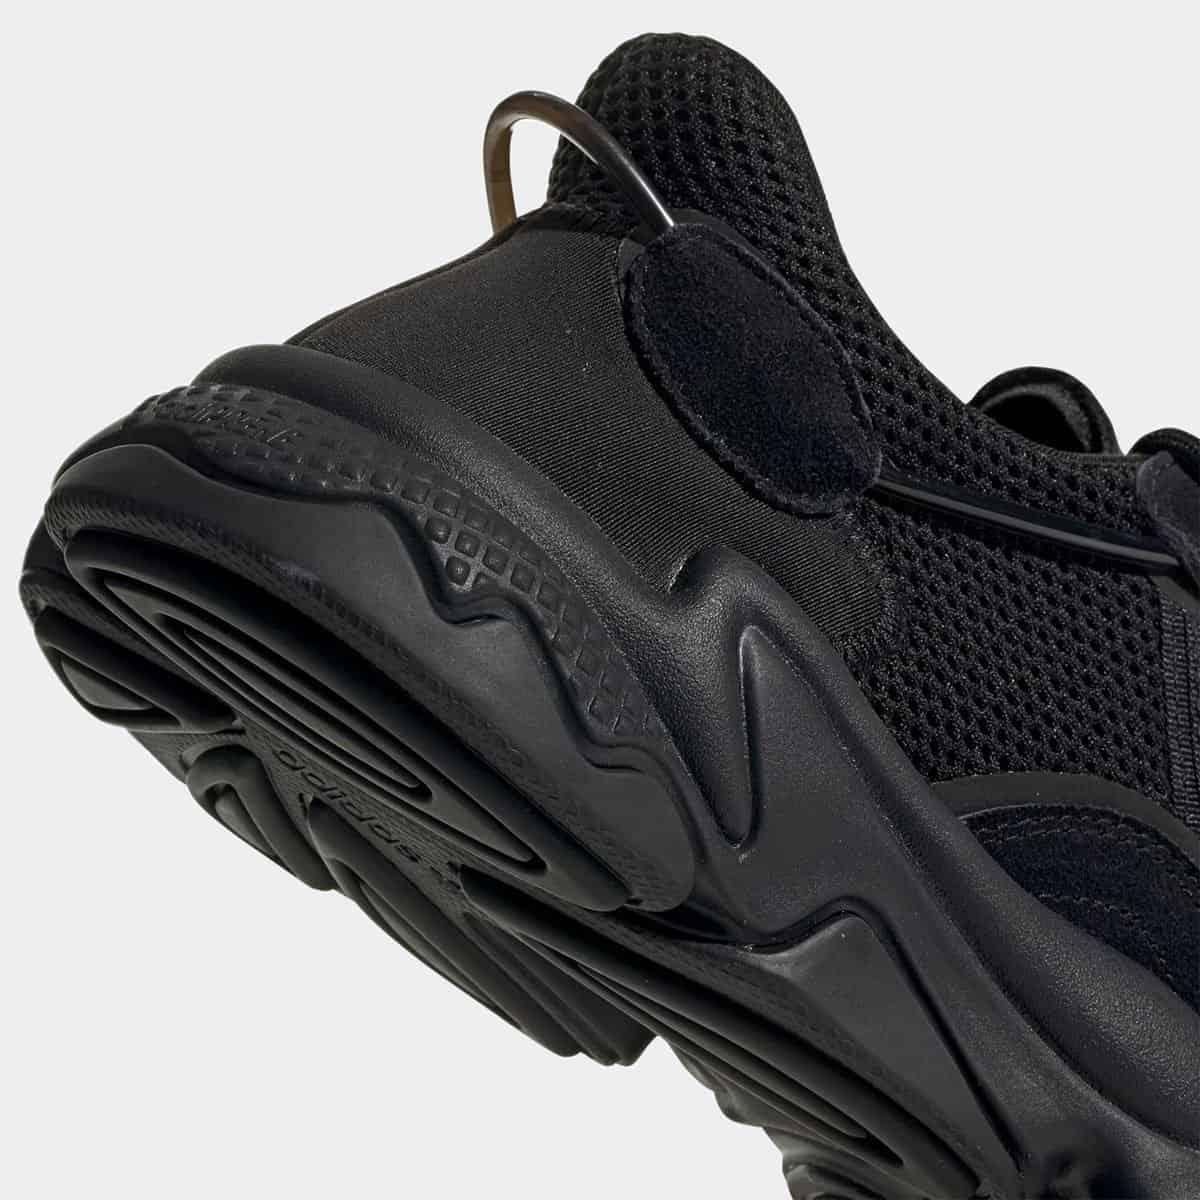 Adidas Ozweego Black 8